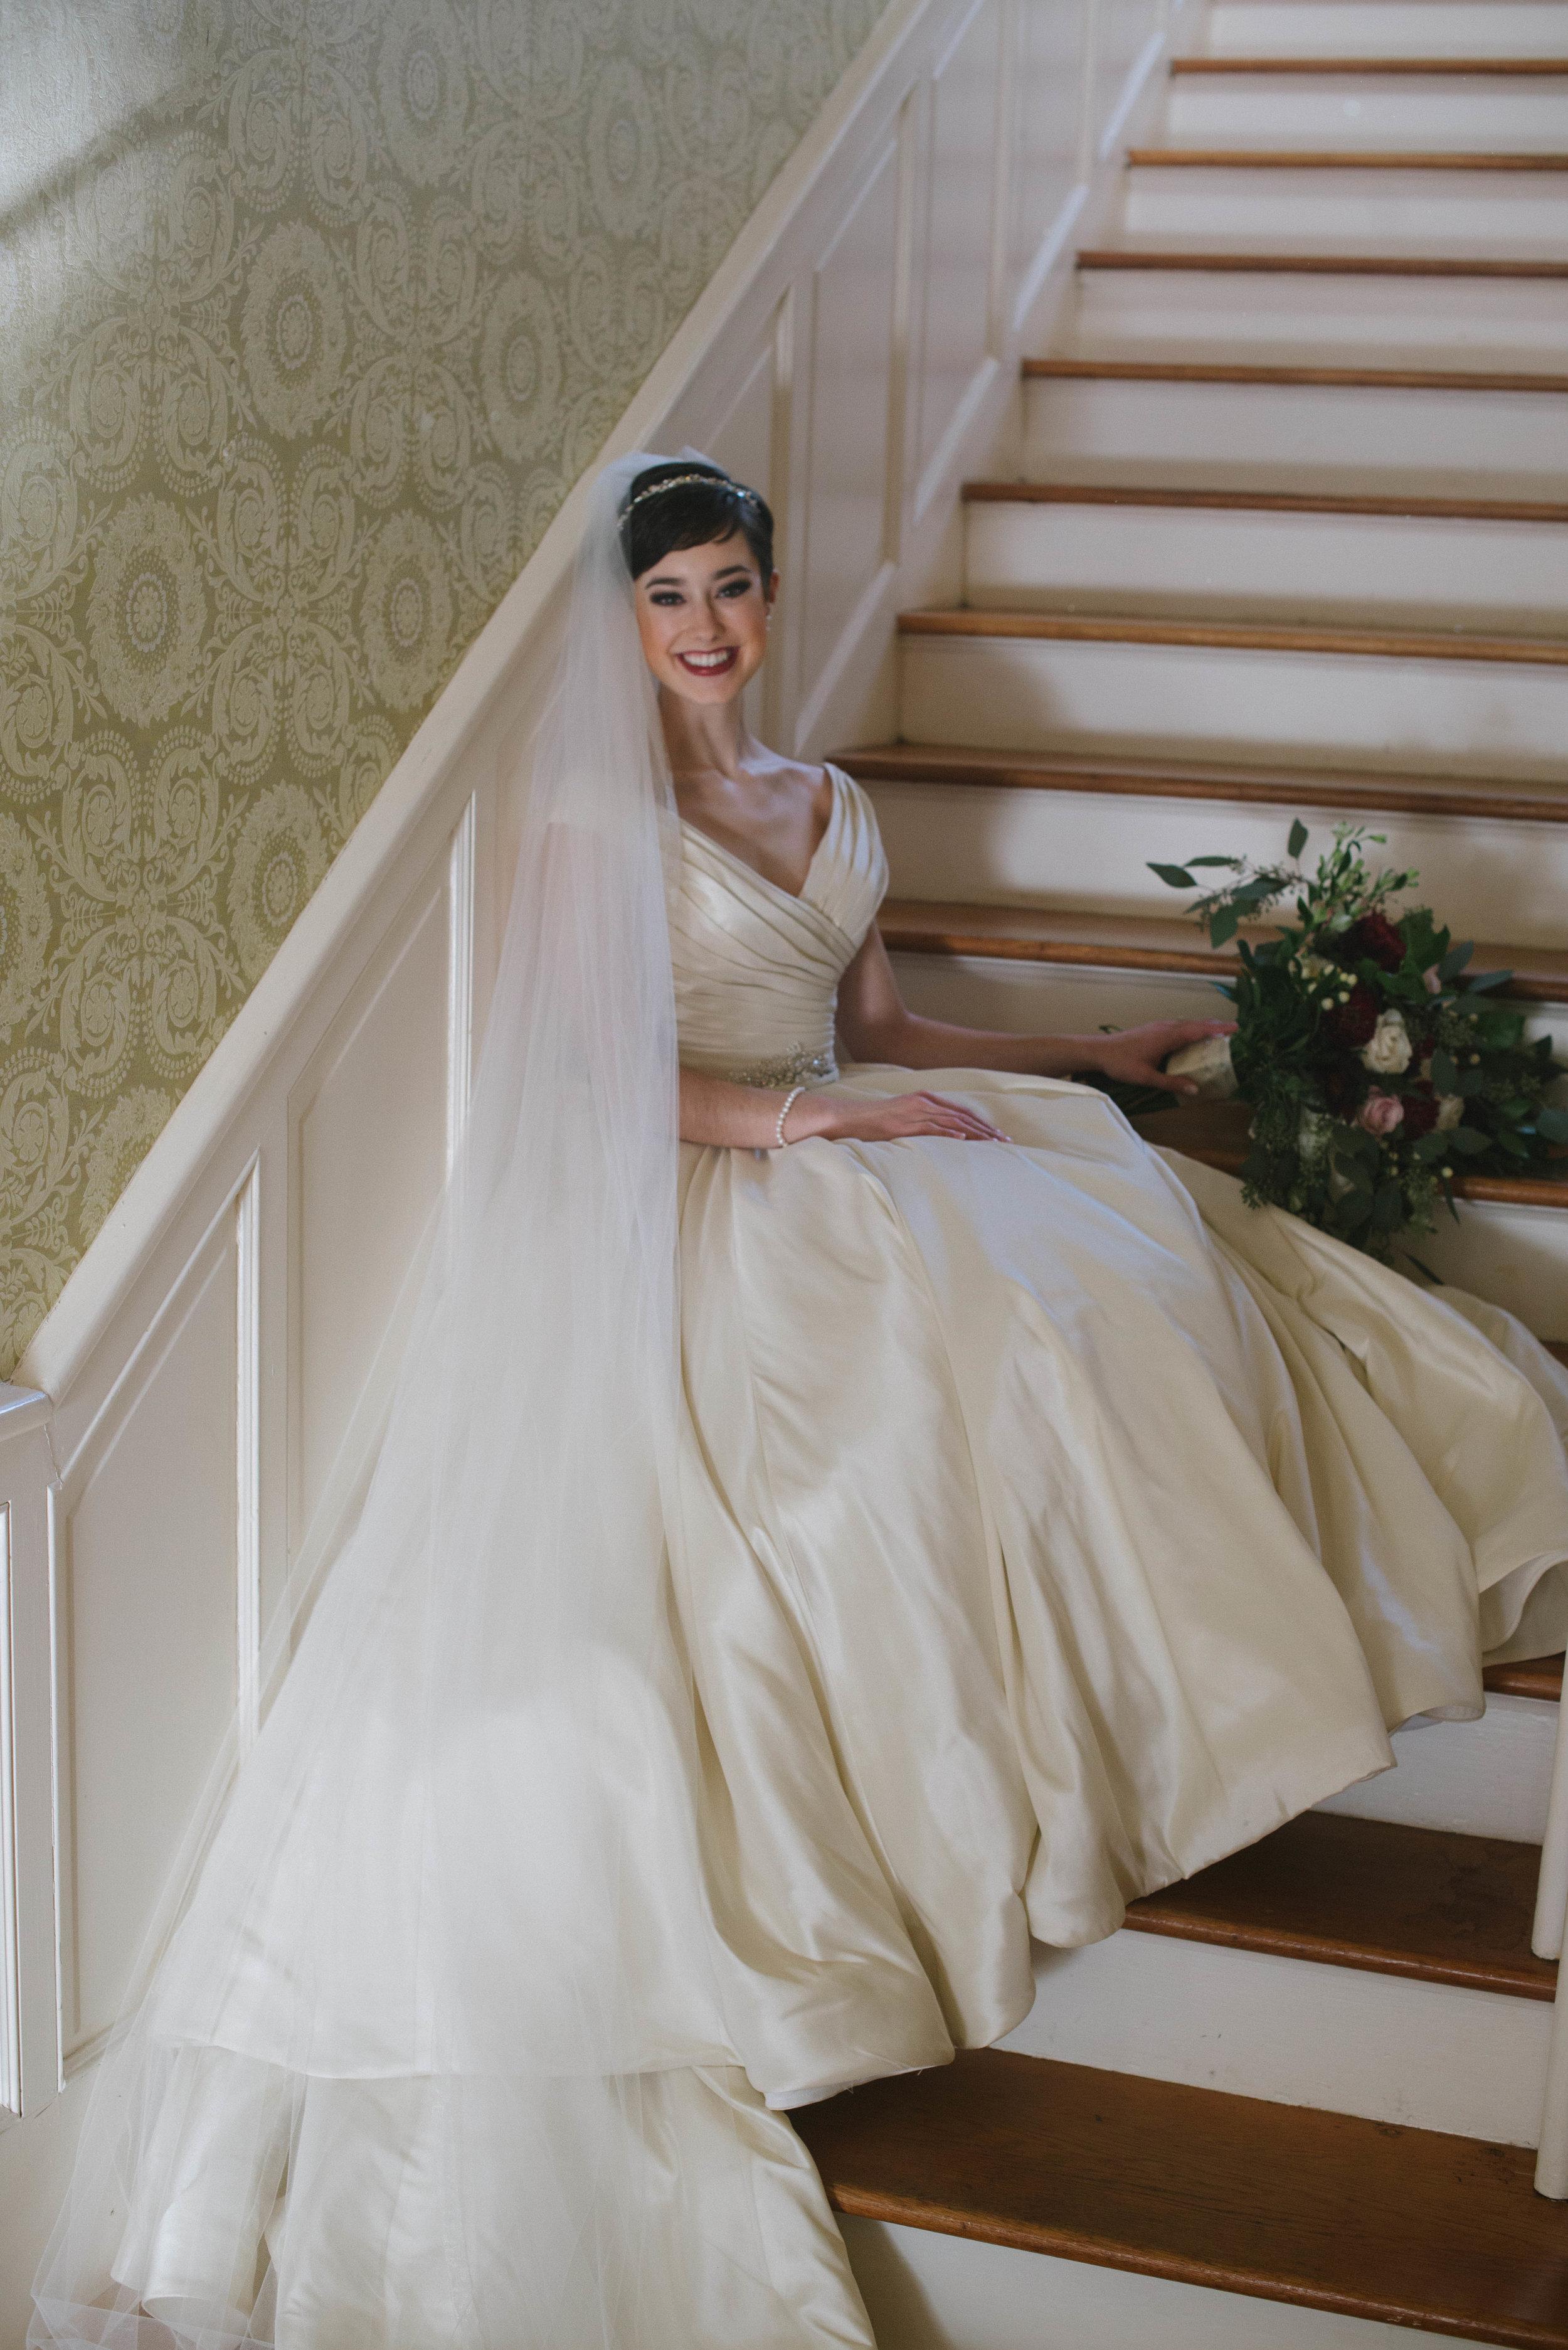 CarolineMerritt|Bridals|_Color_MiraPhotographs-12.jpg